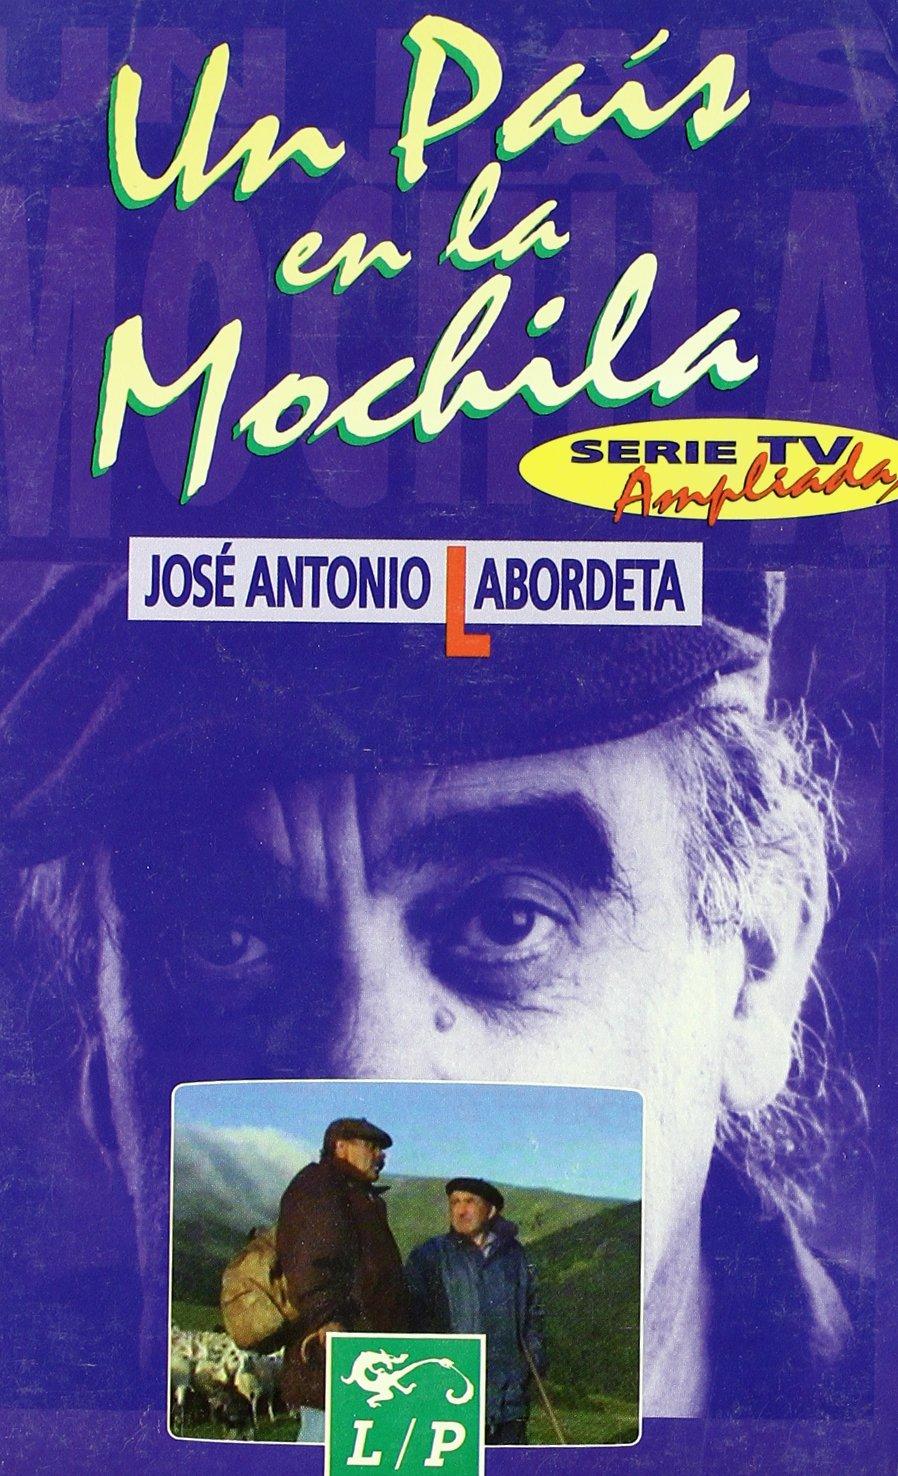 Un país en la mochila (Serie TV ampliada) (Spanish Edition) (Spanish) Paperback – 1995